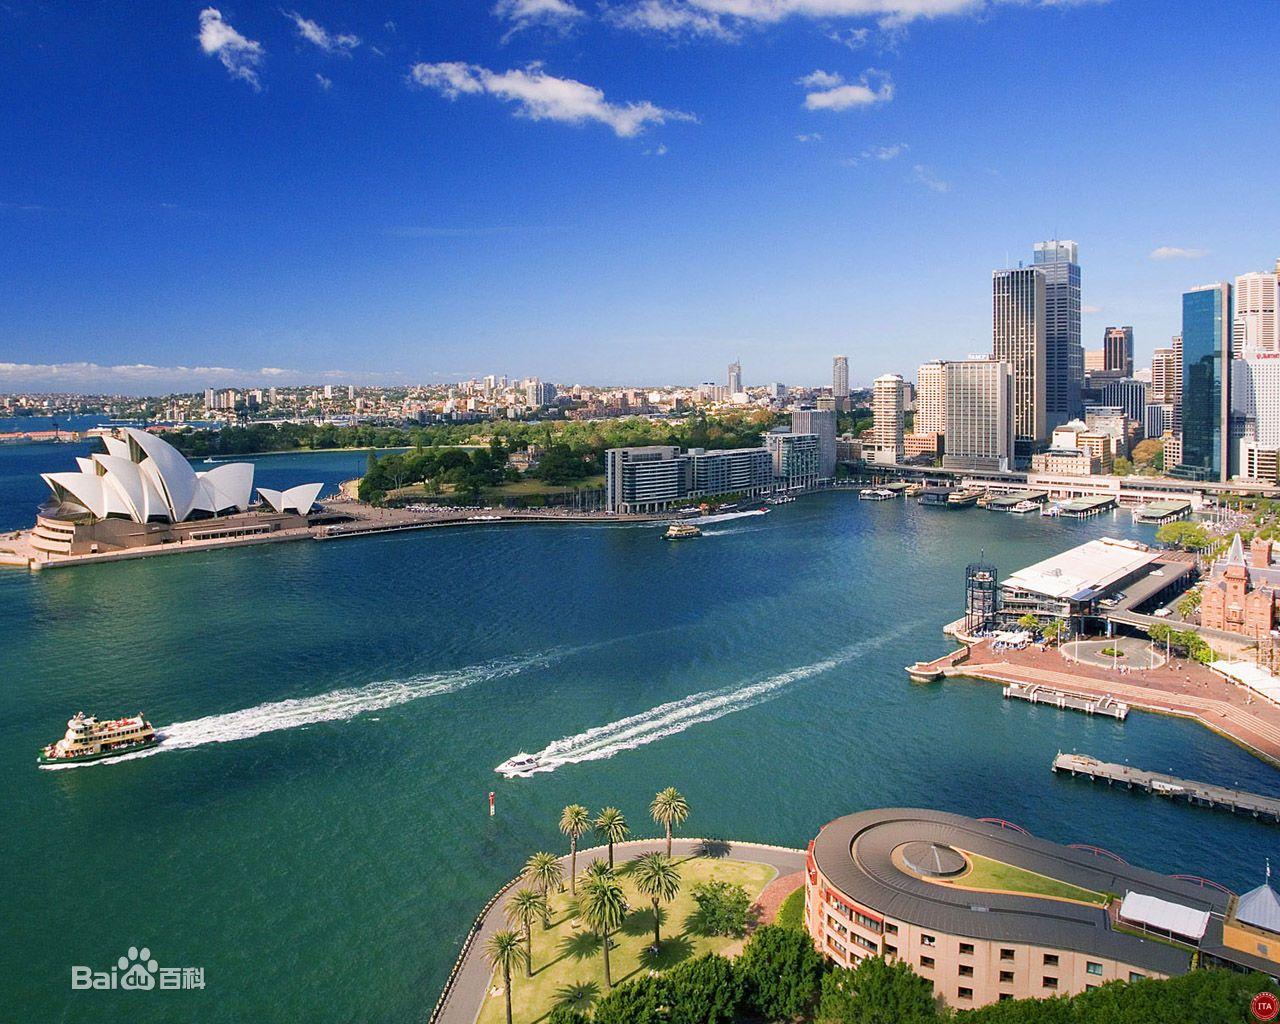 ITA国际汉语教师协会赴澳大利亚中文教师